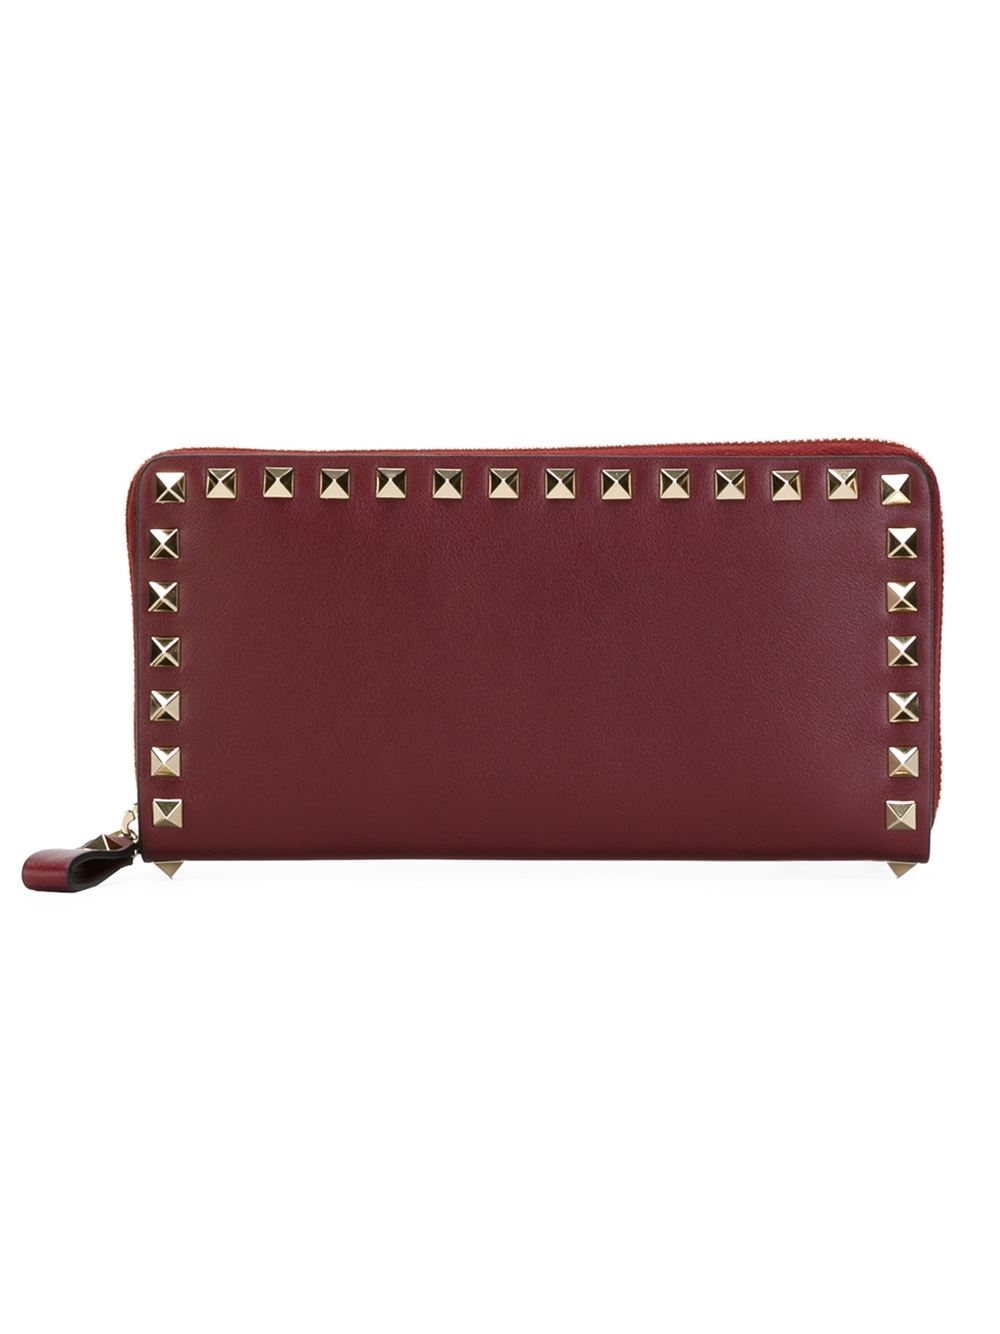 Valentino 'rockstud' Wallet in Red | Lyst